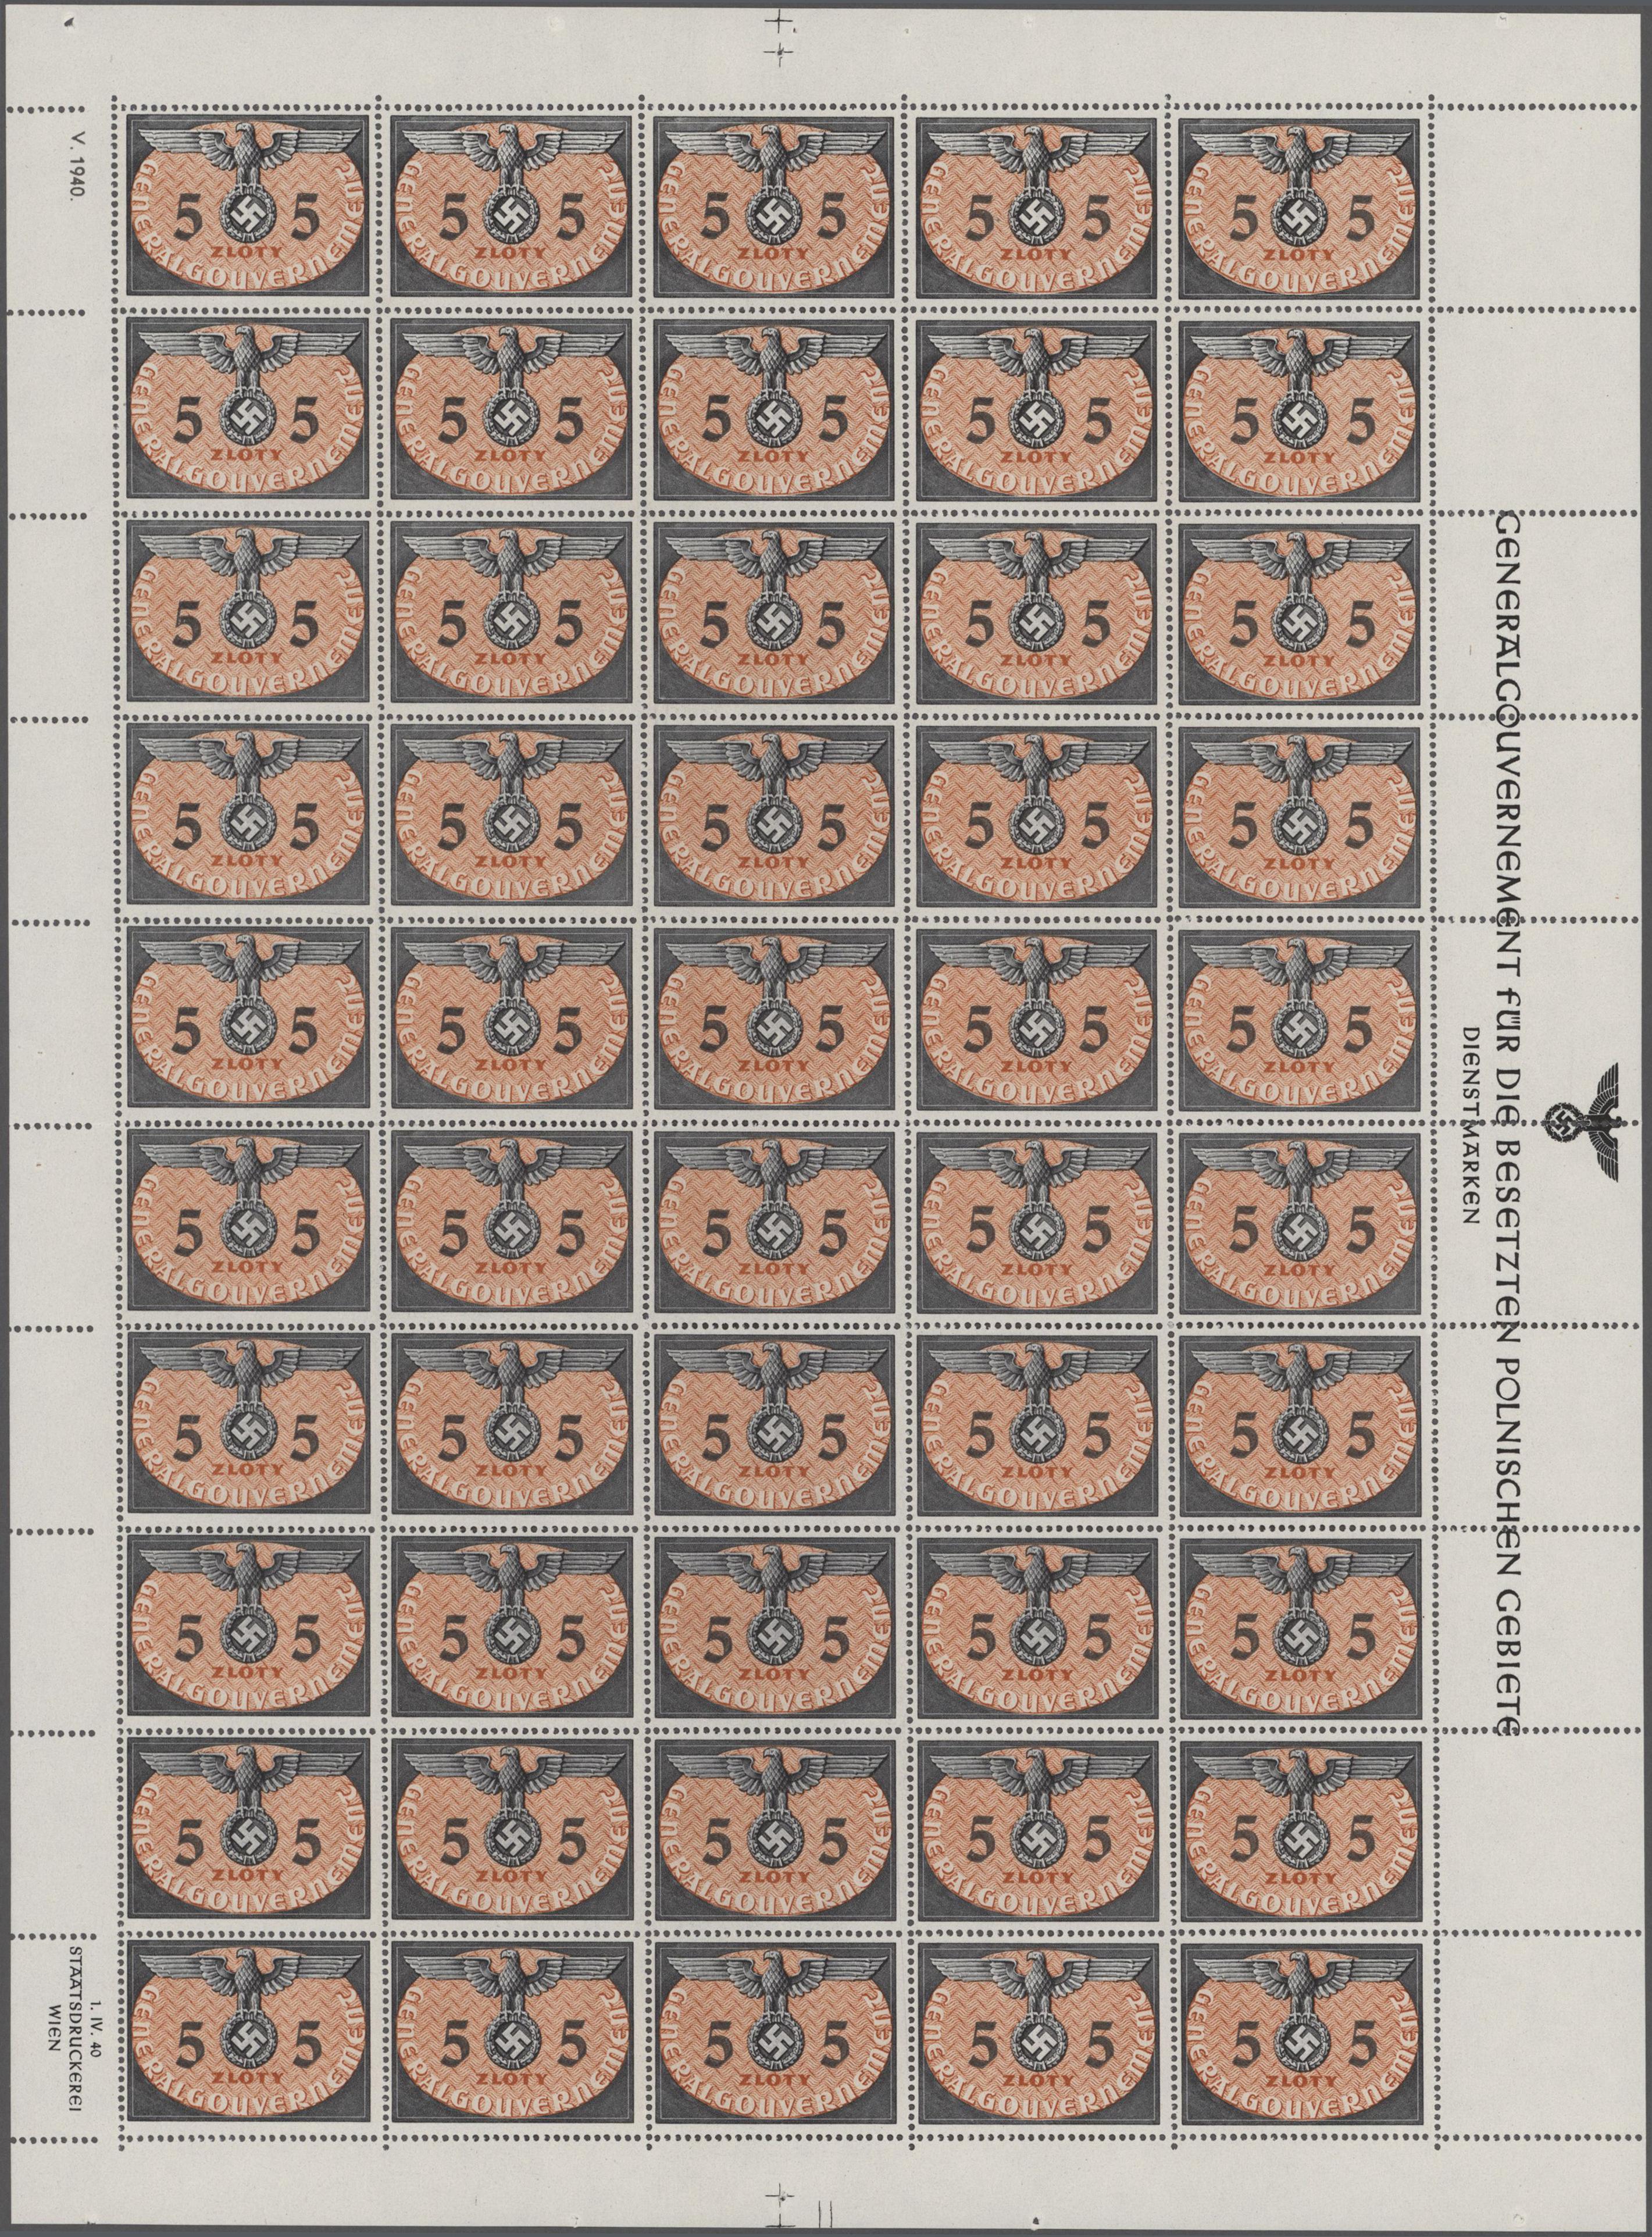 Lot 27483 - Dt. Besetzung II WK - Generalgouvernement - Dienstmarken  -  Auktionshaus Christoph Gärtner GmbH & Co. KG Sale #46 Gollcetions Germany - including the suplement